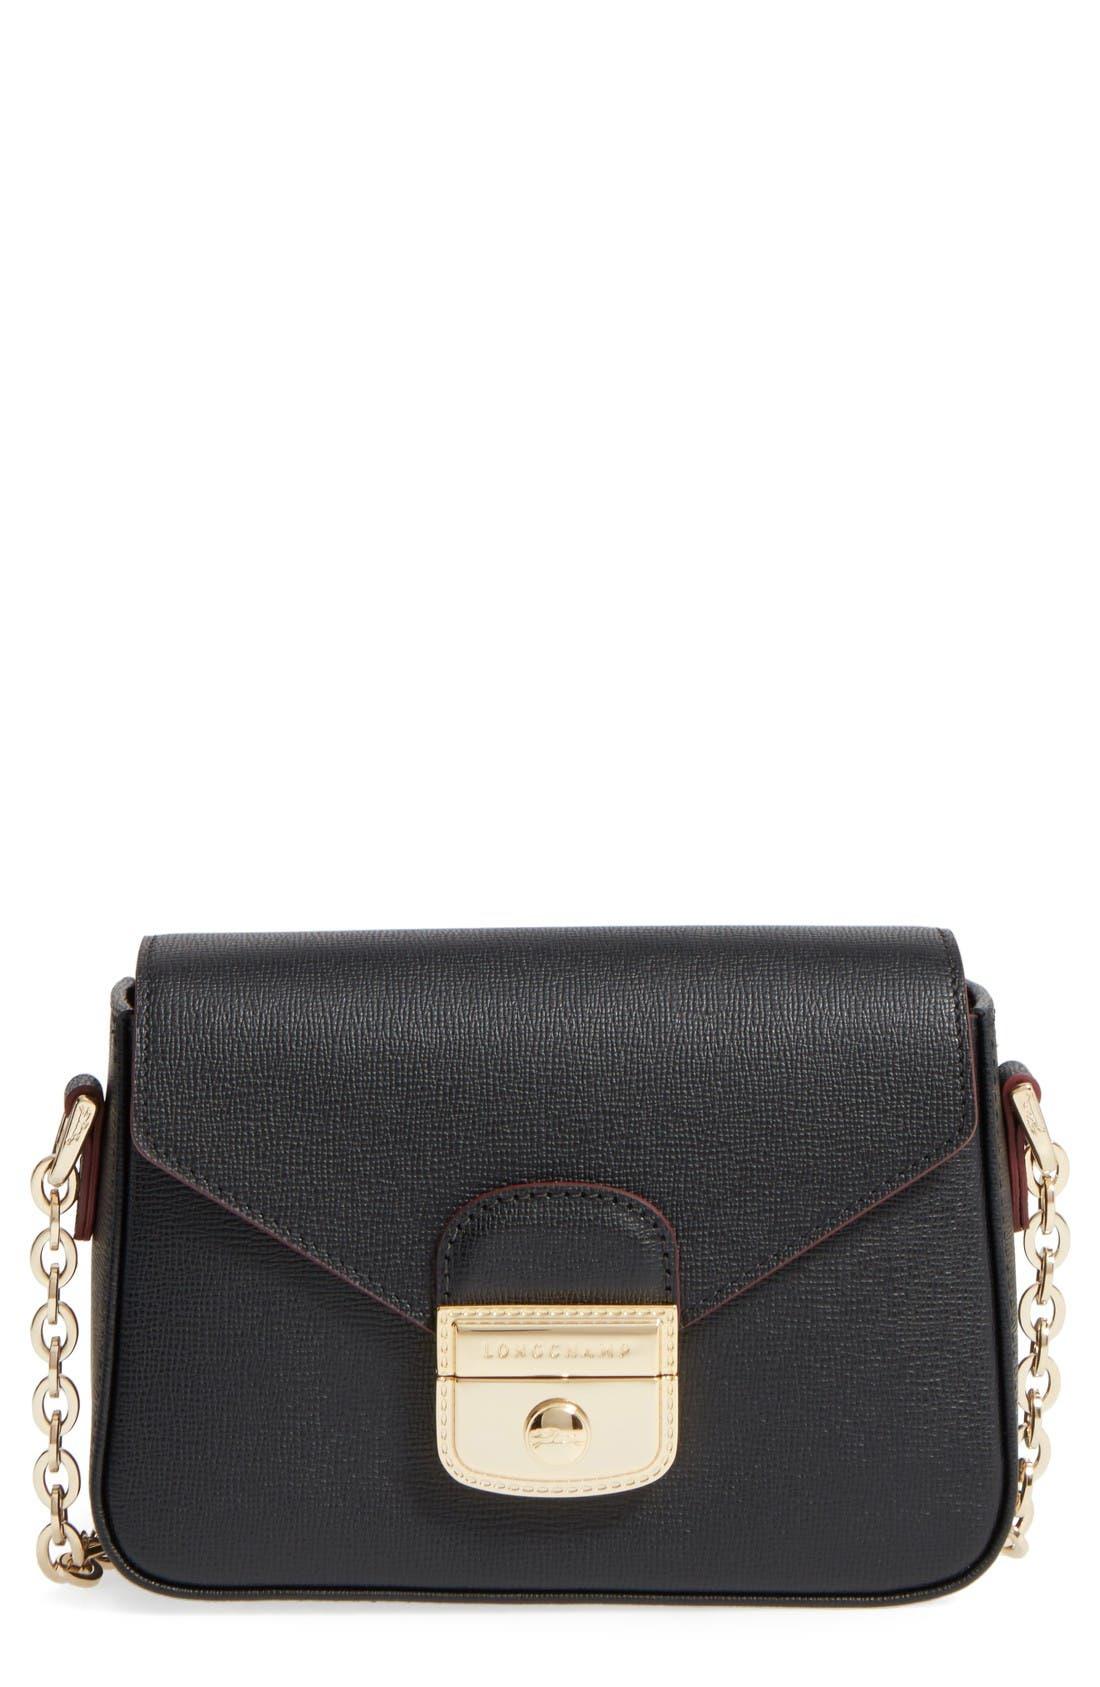 LONGCHAMP Small Le Pliage Heritage Leather Crossbody Bag